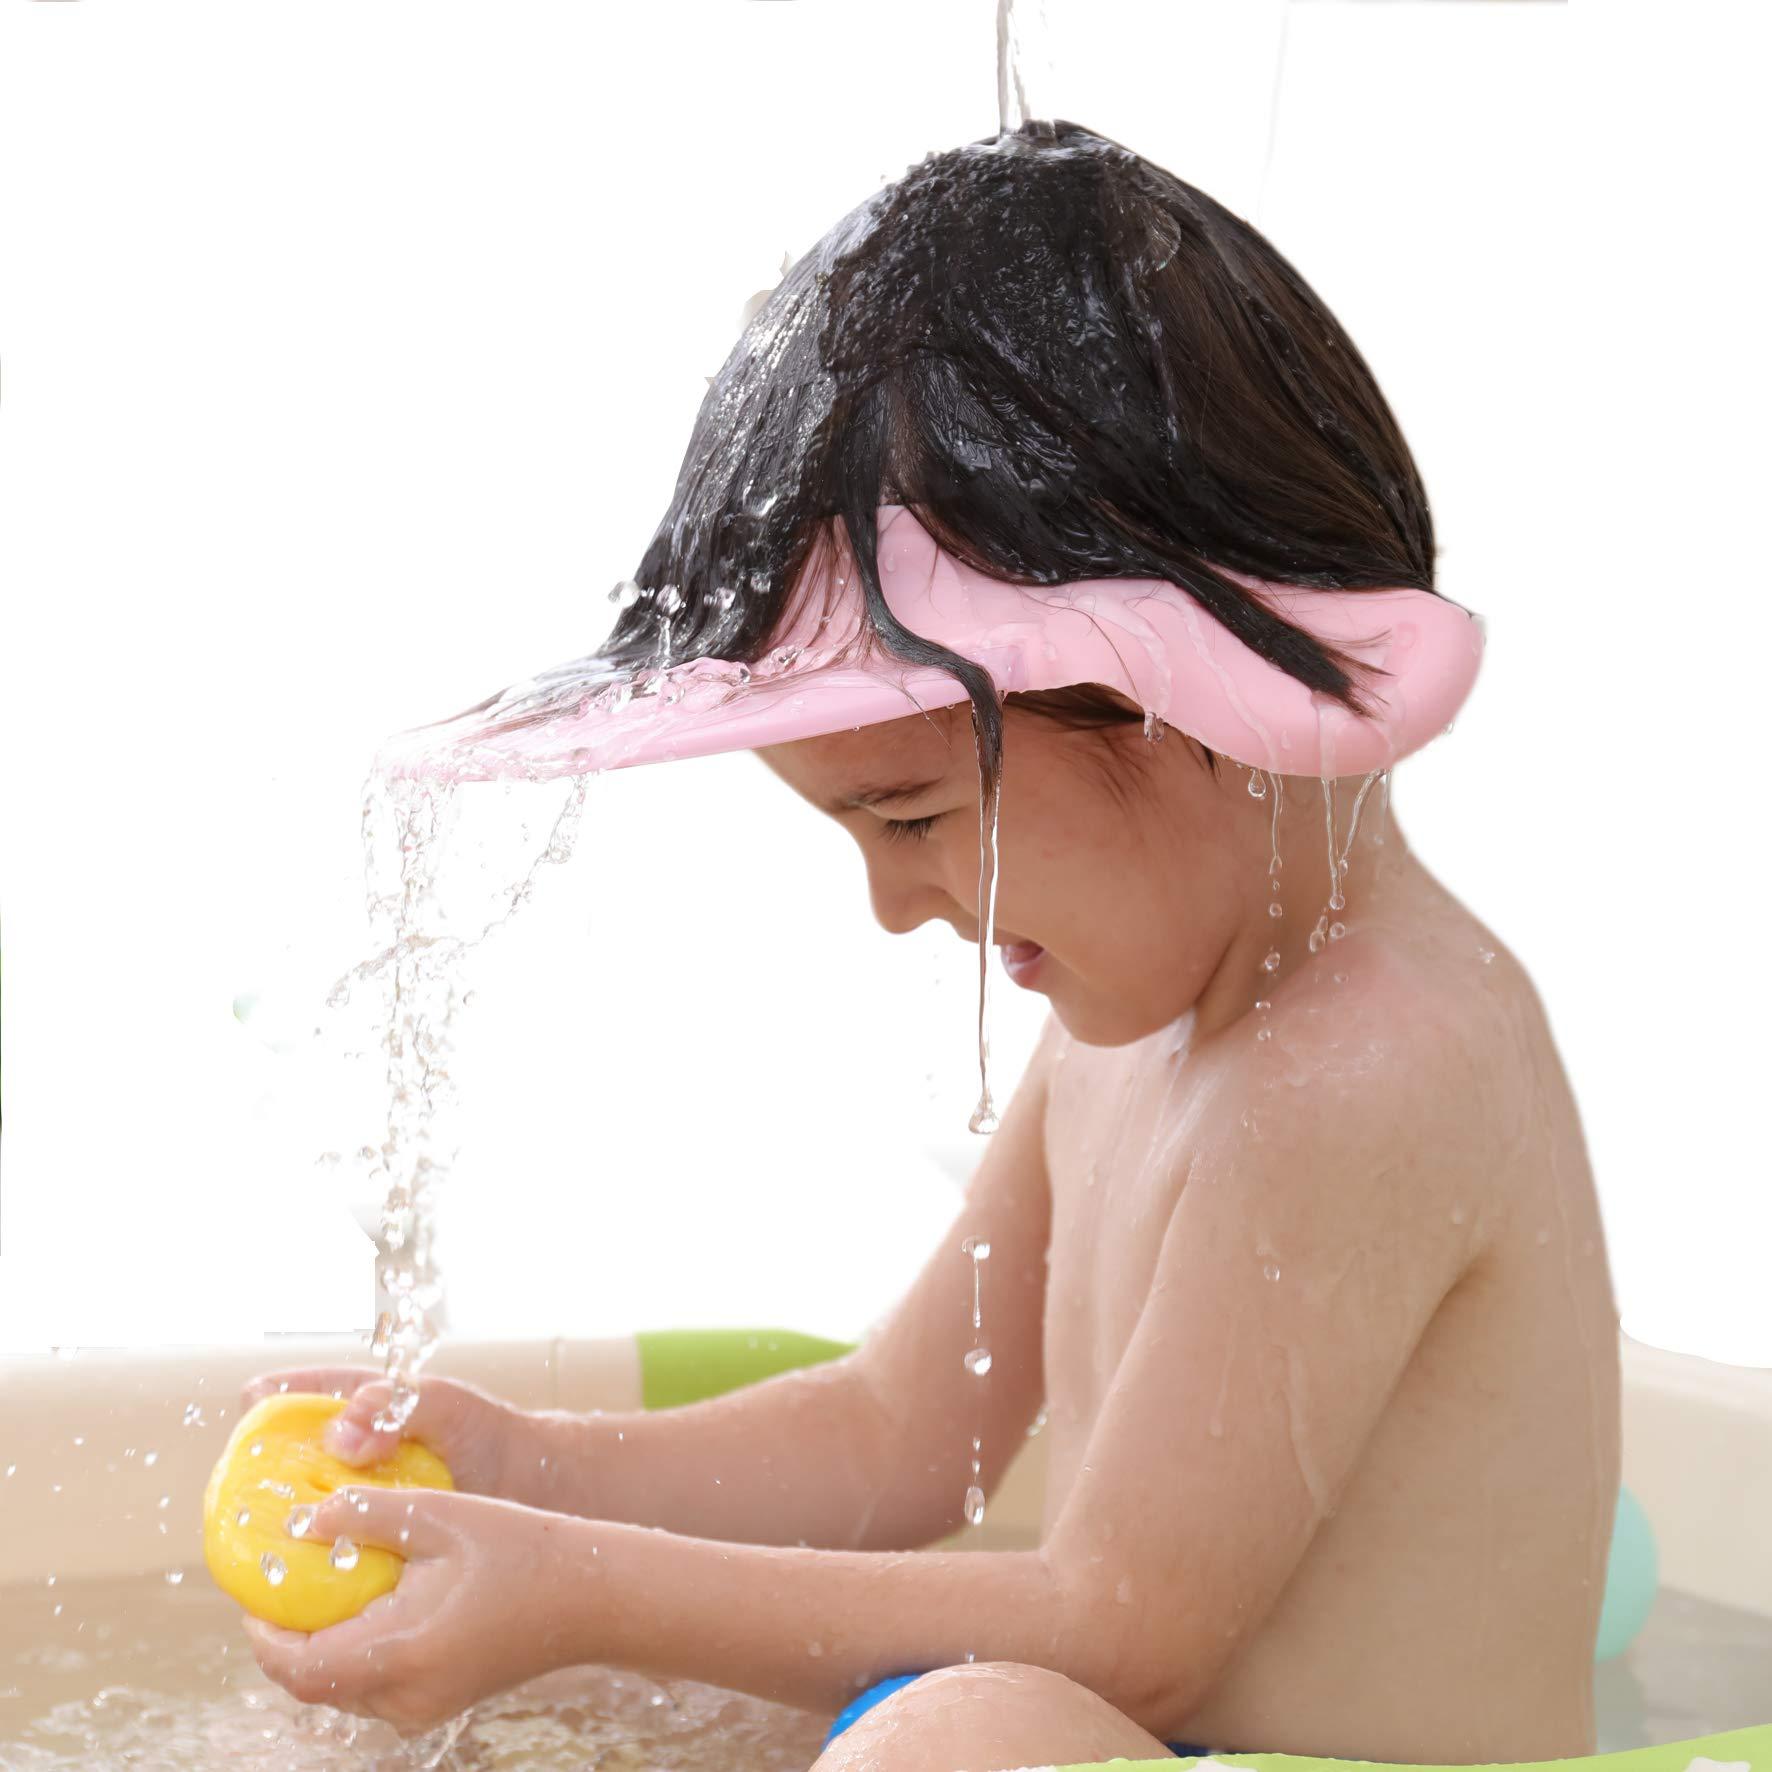 Baby Shower Cap Bath wash Shampoo Shield Visor Bathing tub Head Hair Rinser hat Protection Kids and Toddler